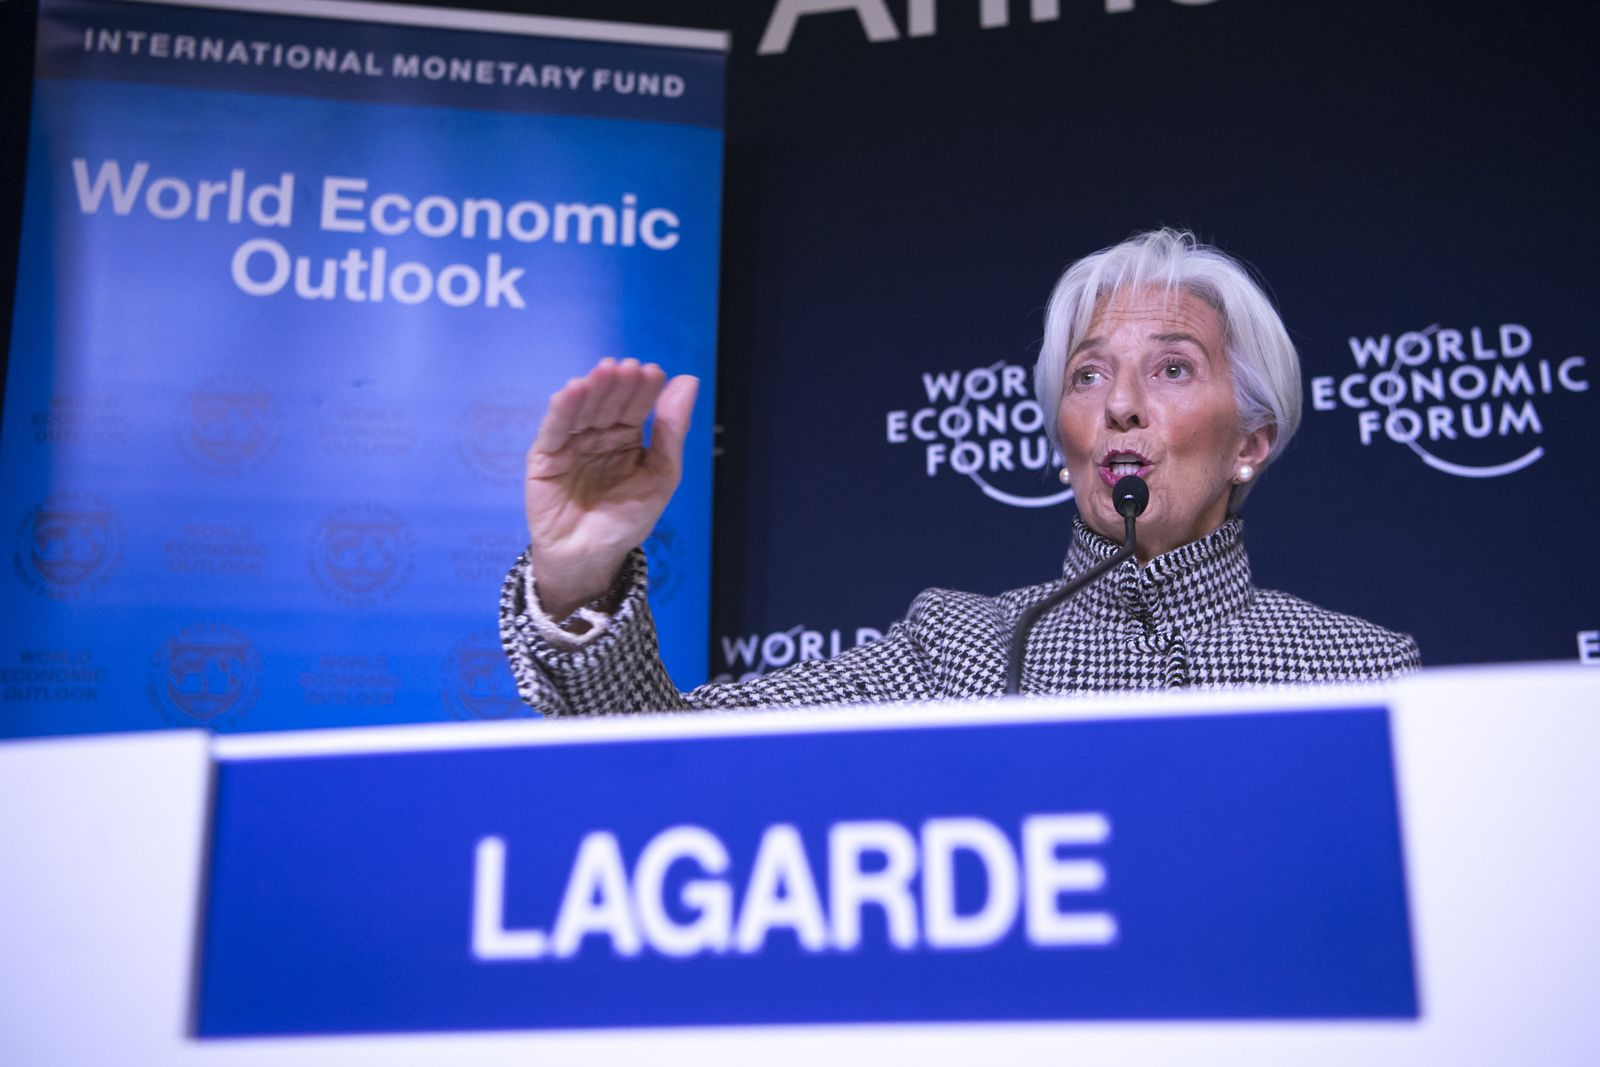 SWITZERLAND WORLD ECONOMIC FORUM WEF 2019